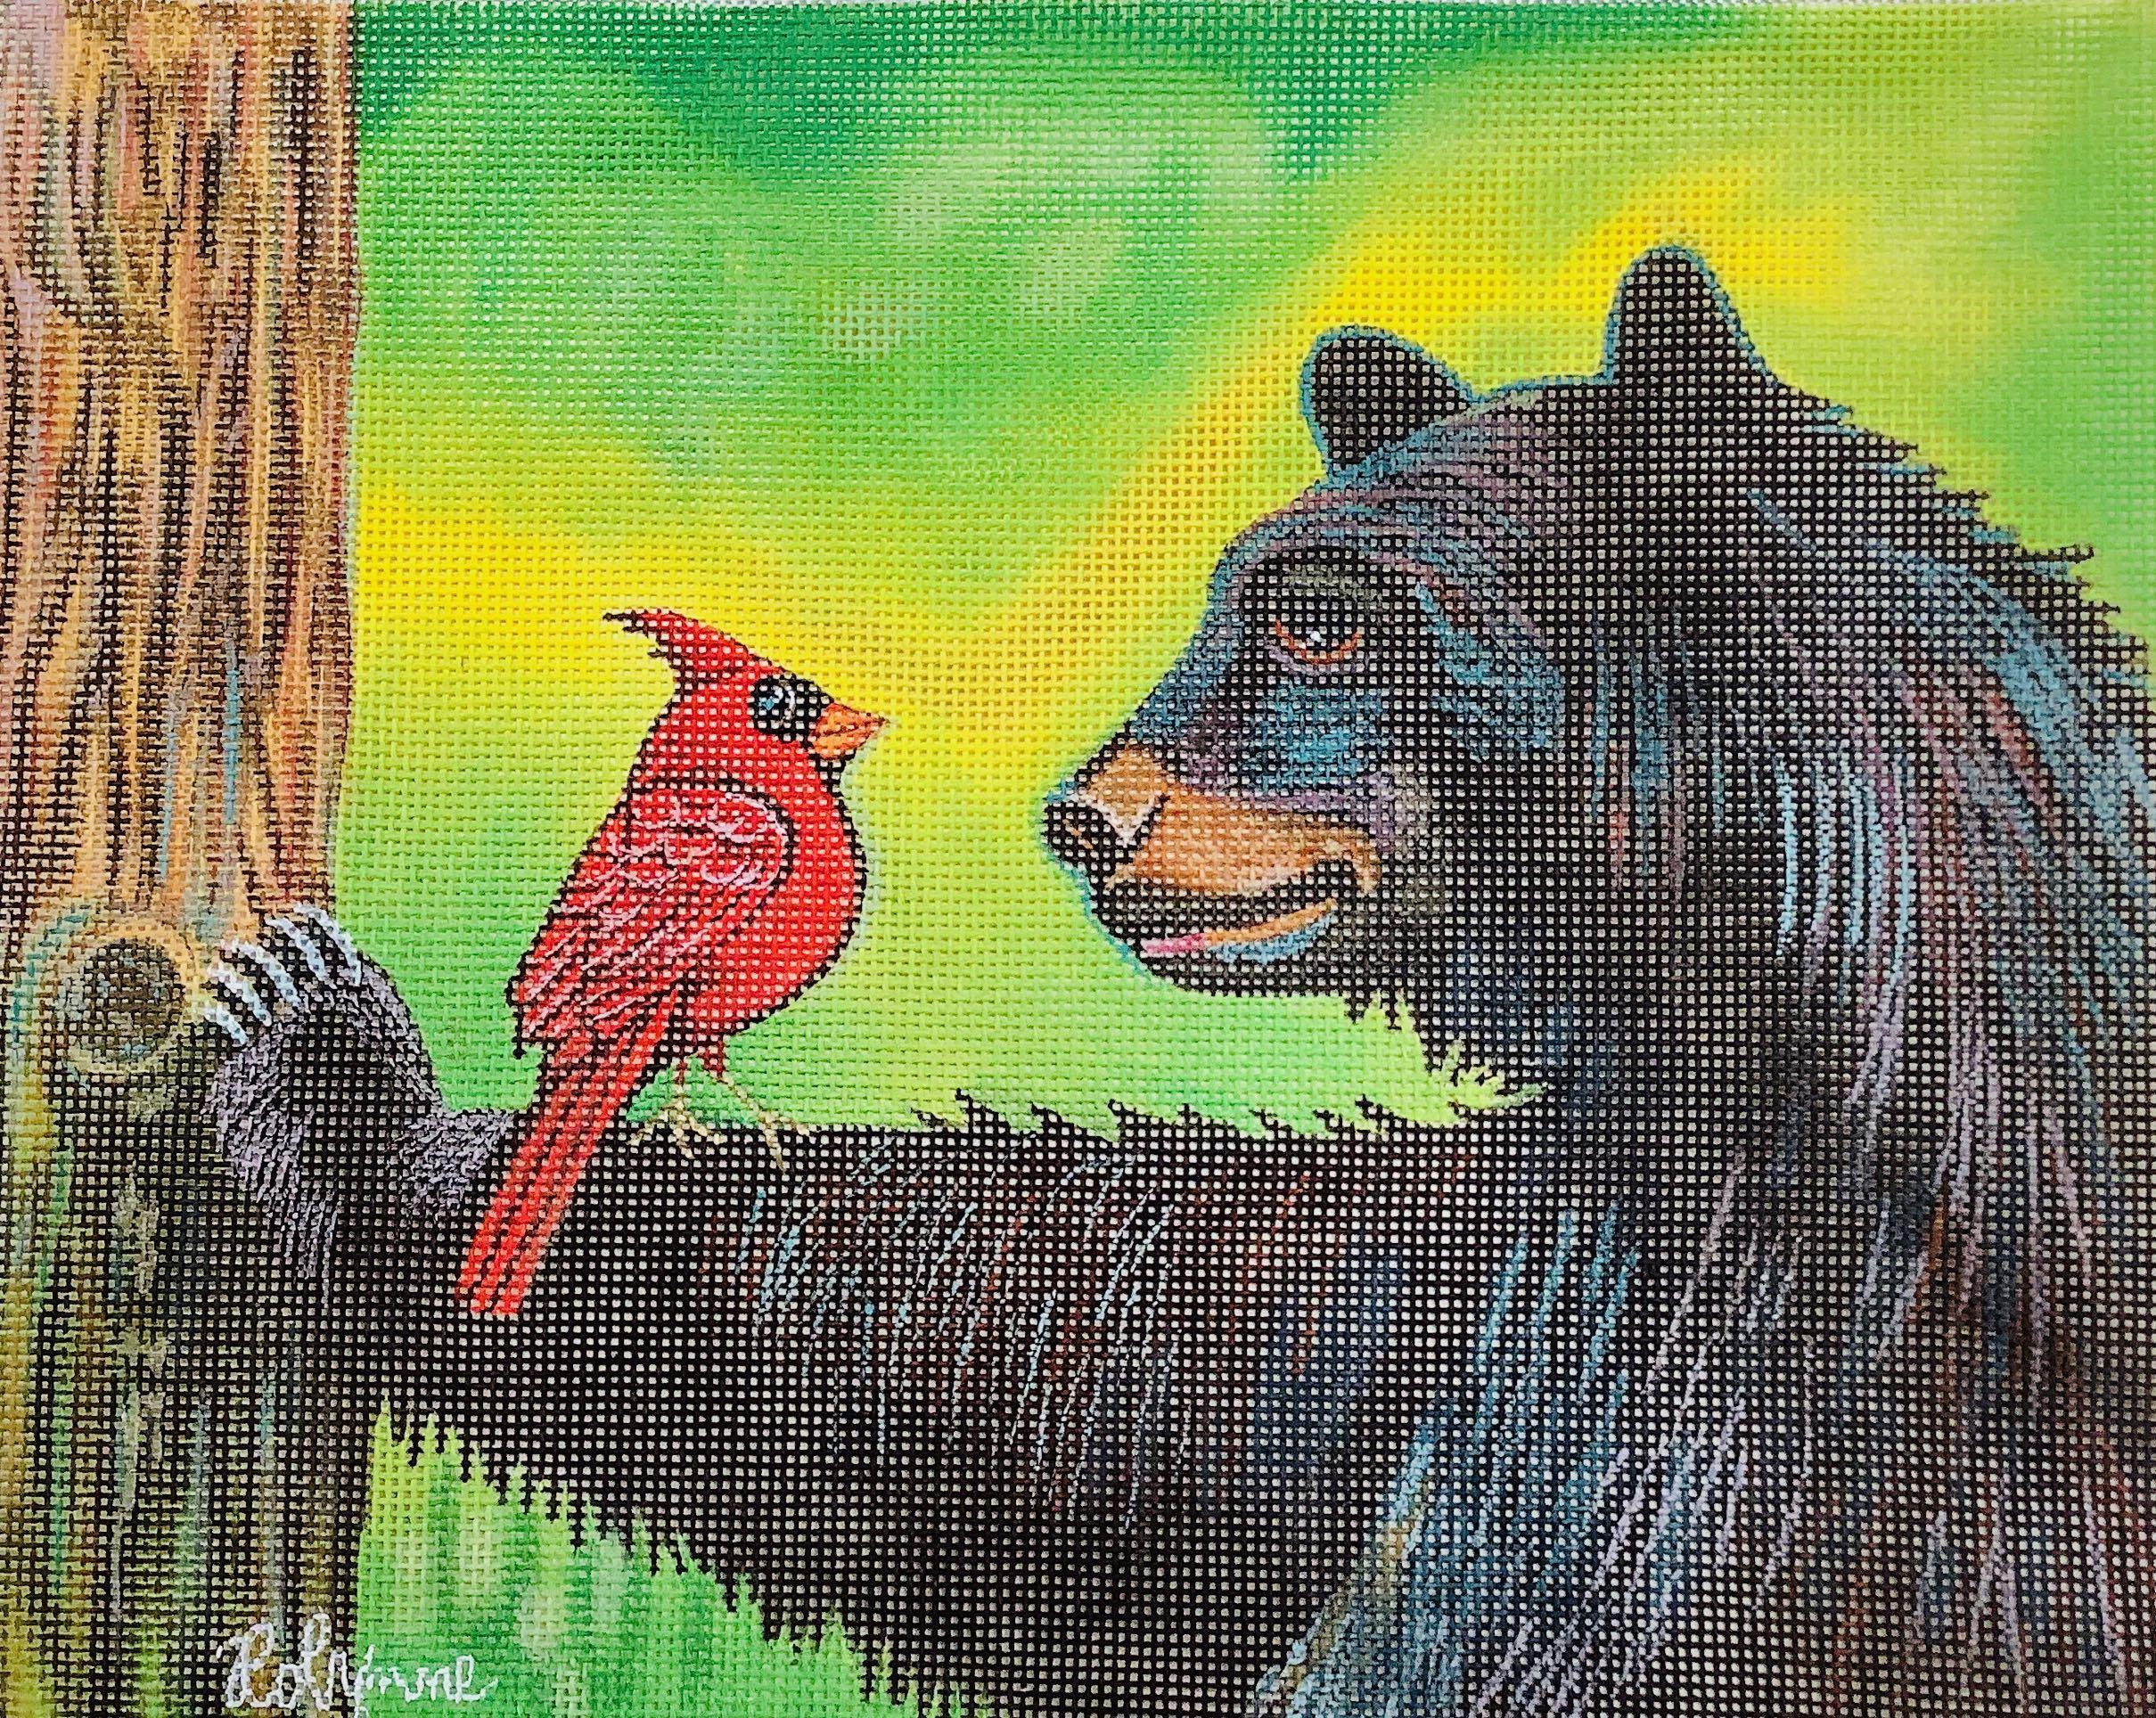 TCRN608 The Negotiation Cardinal and Bear Chris Lewis Distributing